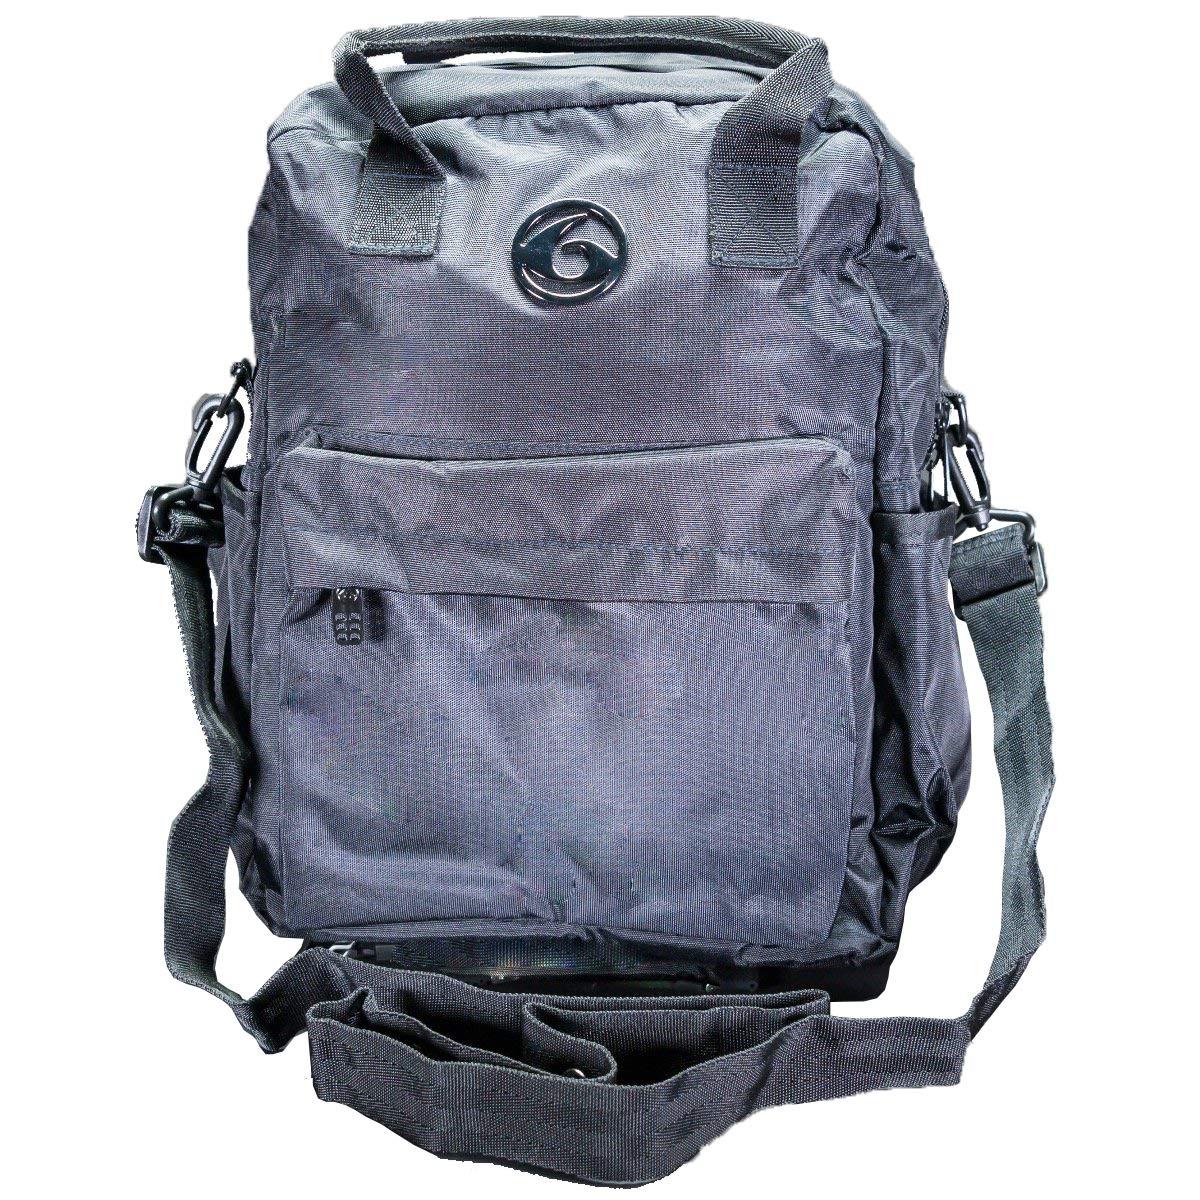 6 Pack Fitness Explorer Backpack Meal Management System 300 Stealth Black w/Bonus Zogosportz Cyclone Shaker